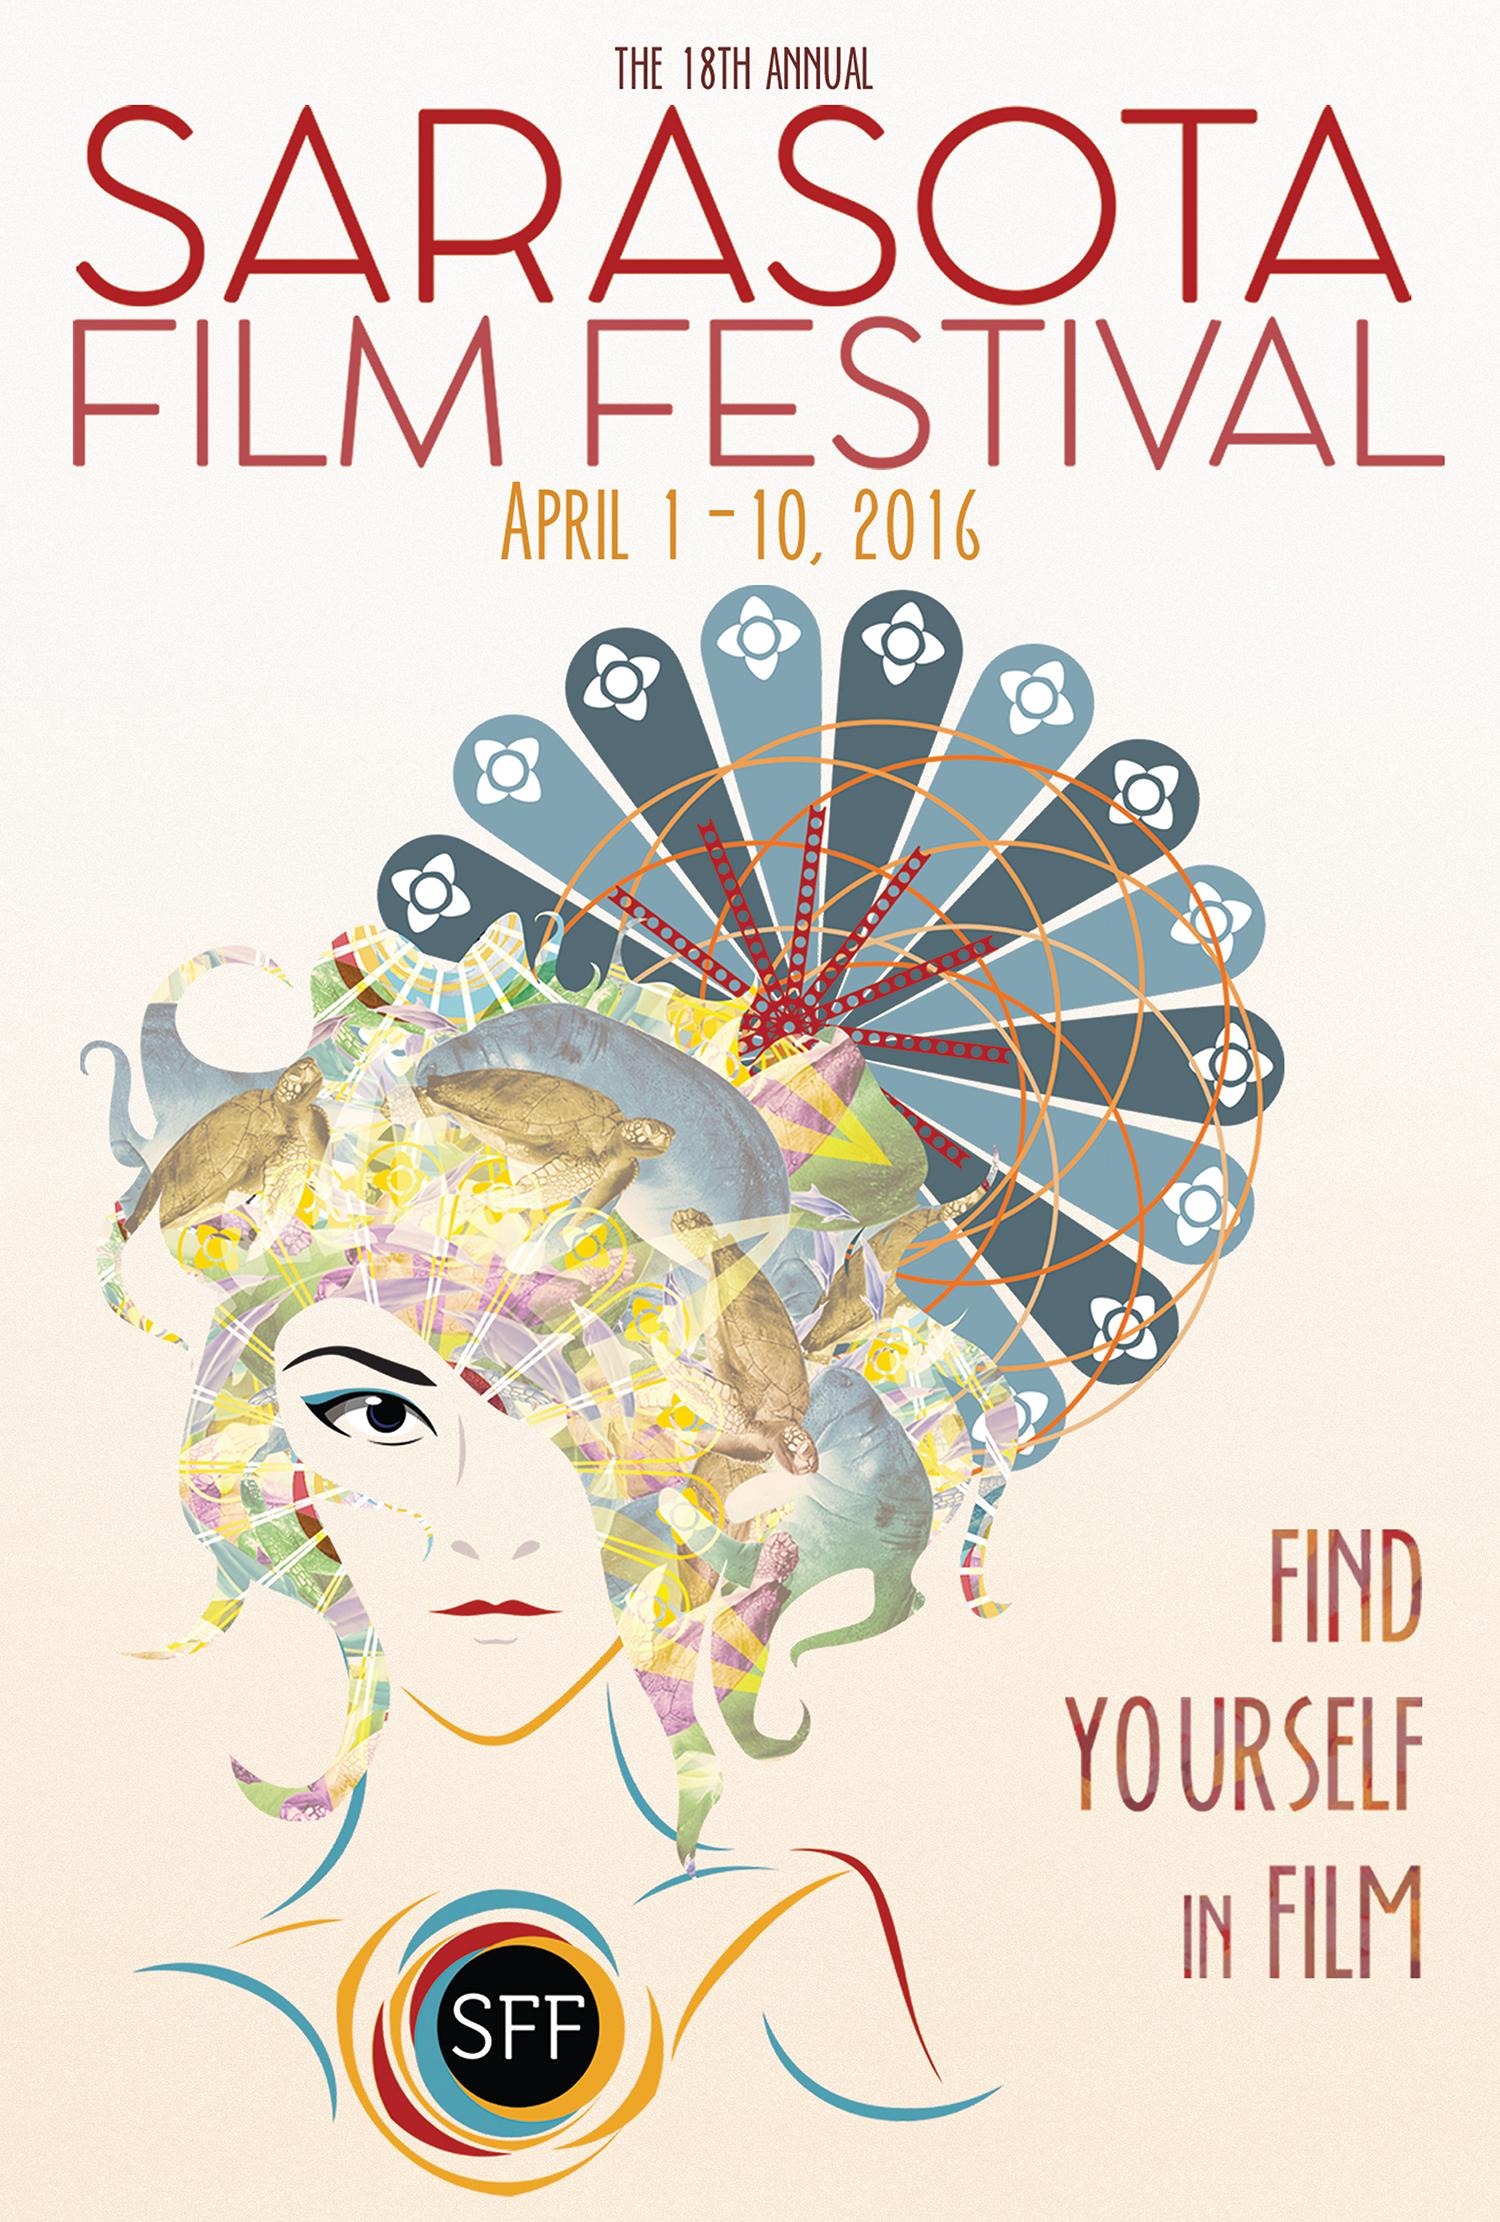 Last October The Sarasota Film Festival